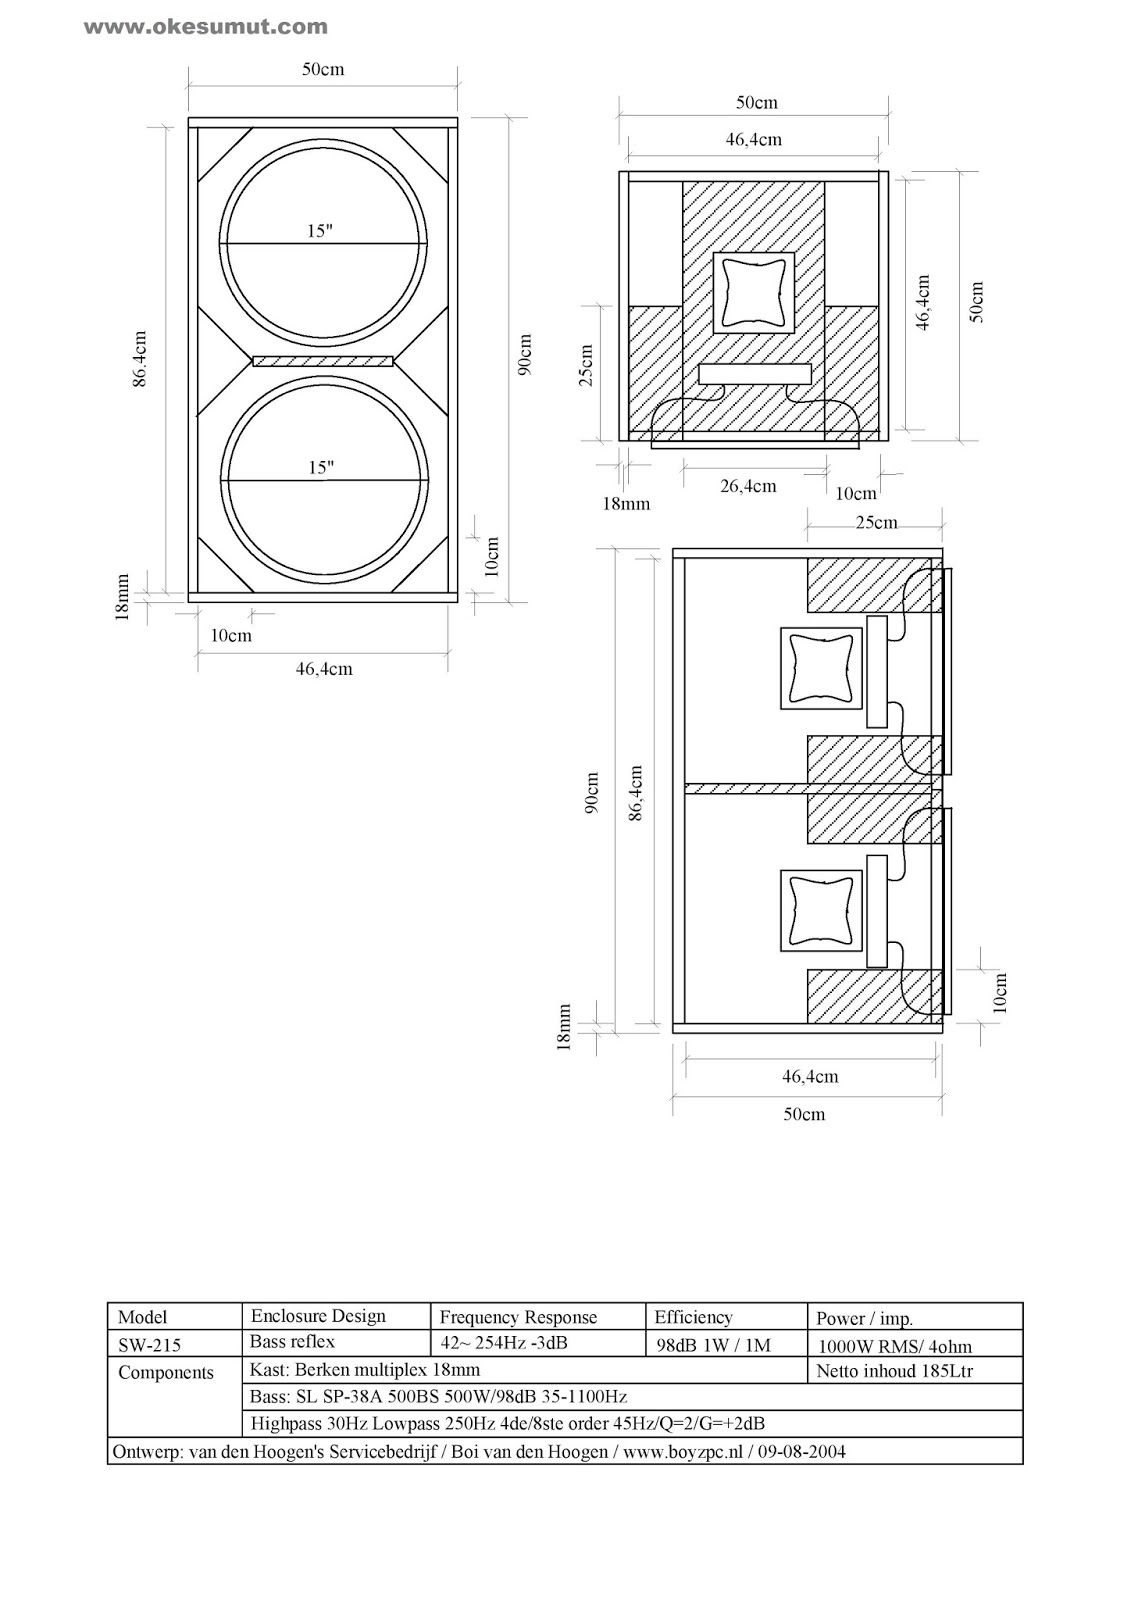 medium resolution of box speaker 15x2 bass selamat datang sebelumnya di oeksumut disini diagram chart box speaker